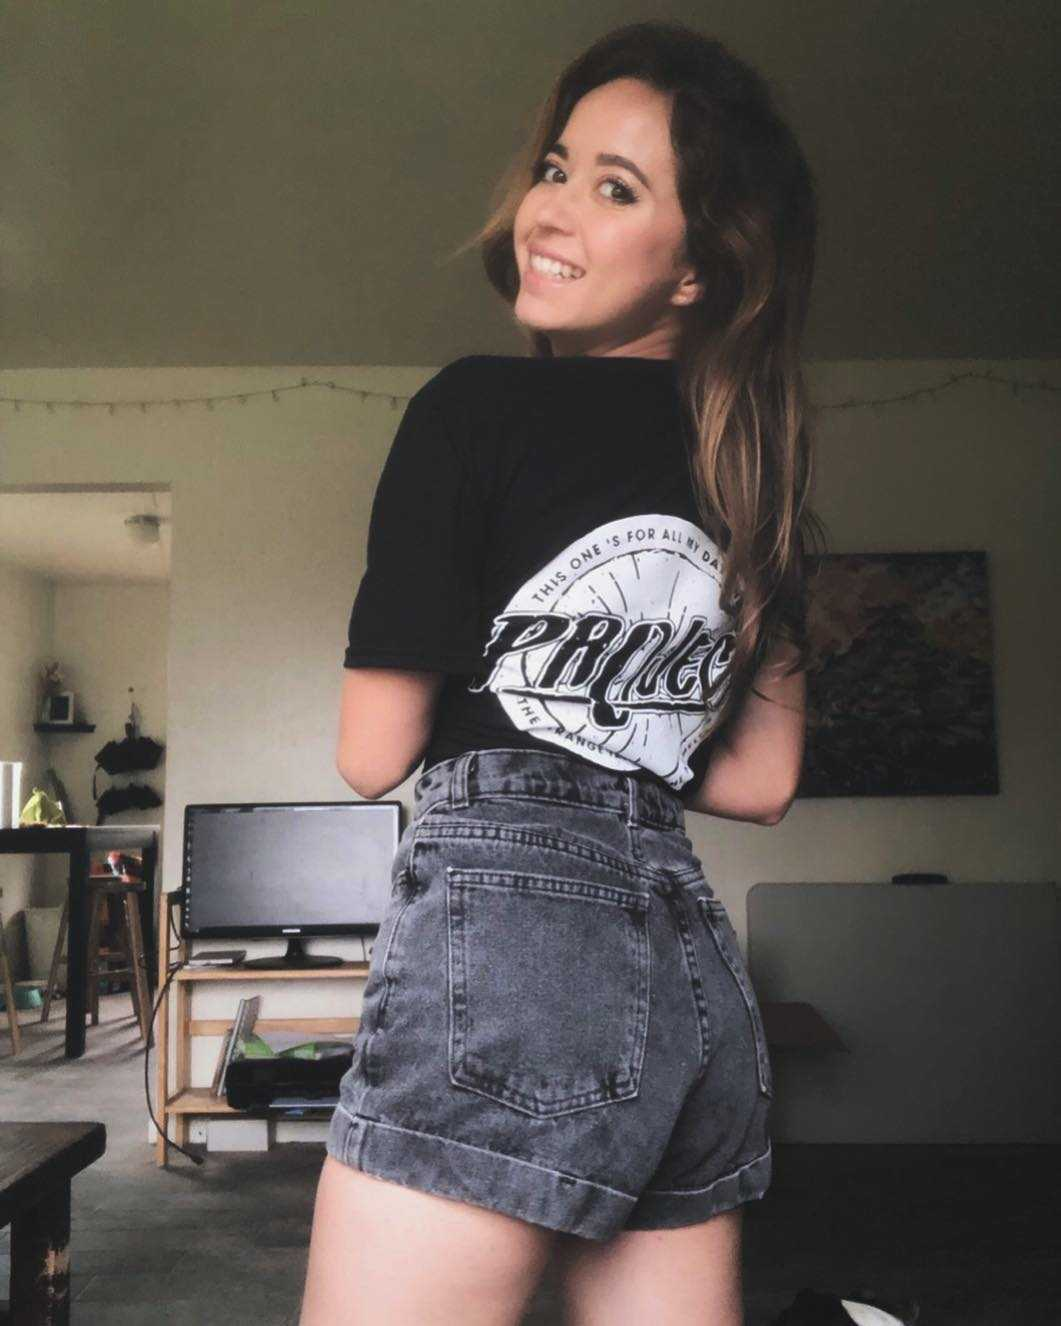 Instagram: mayahiga